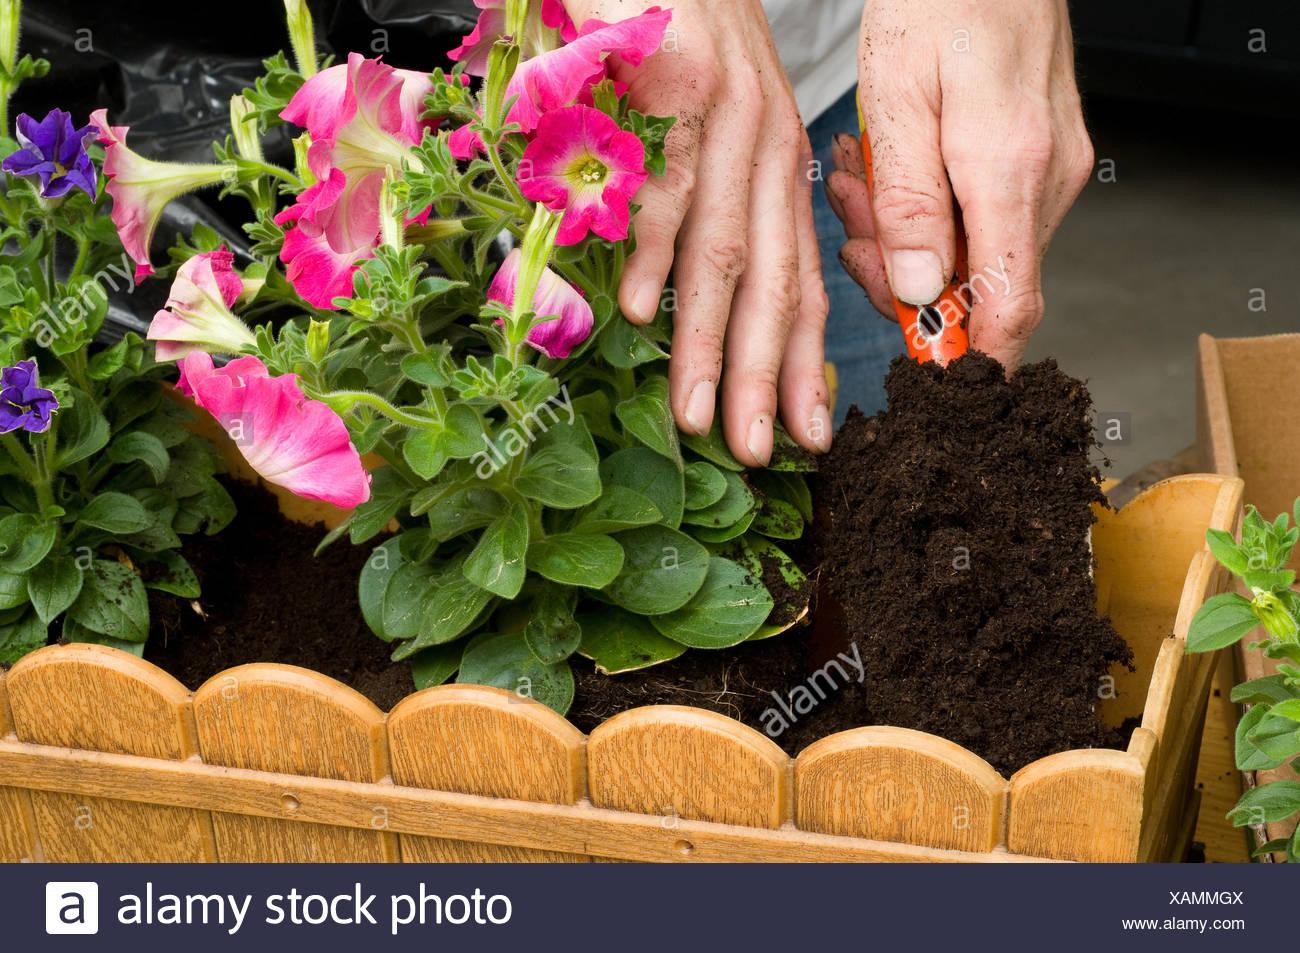 Balkonbepflanzung Planting Petunias Stock Photo 281967642 Alamy